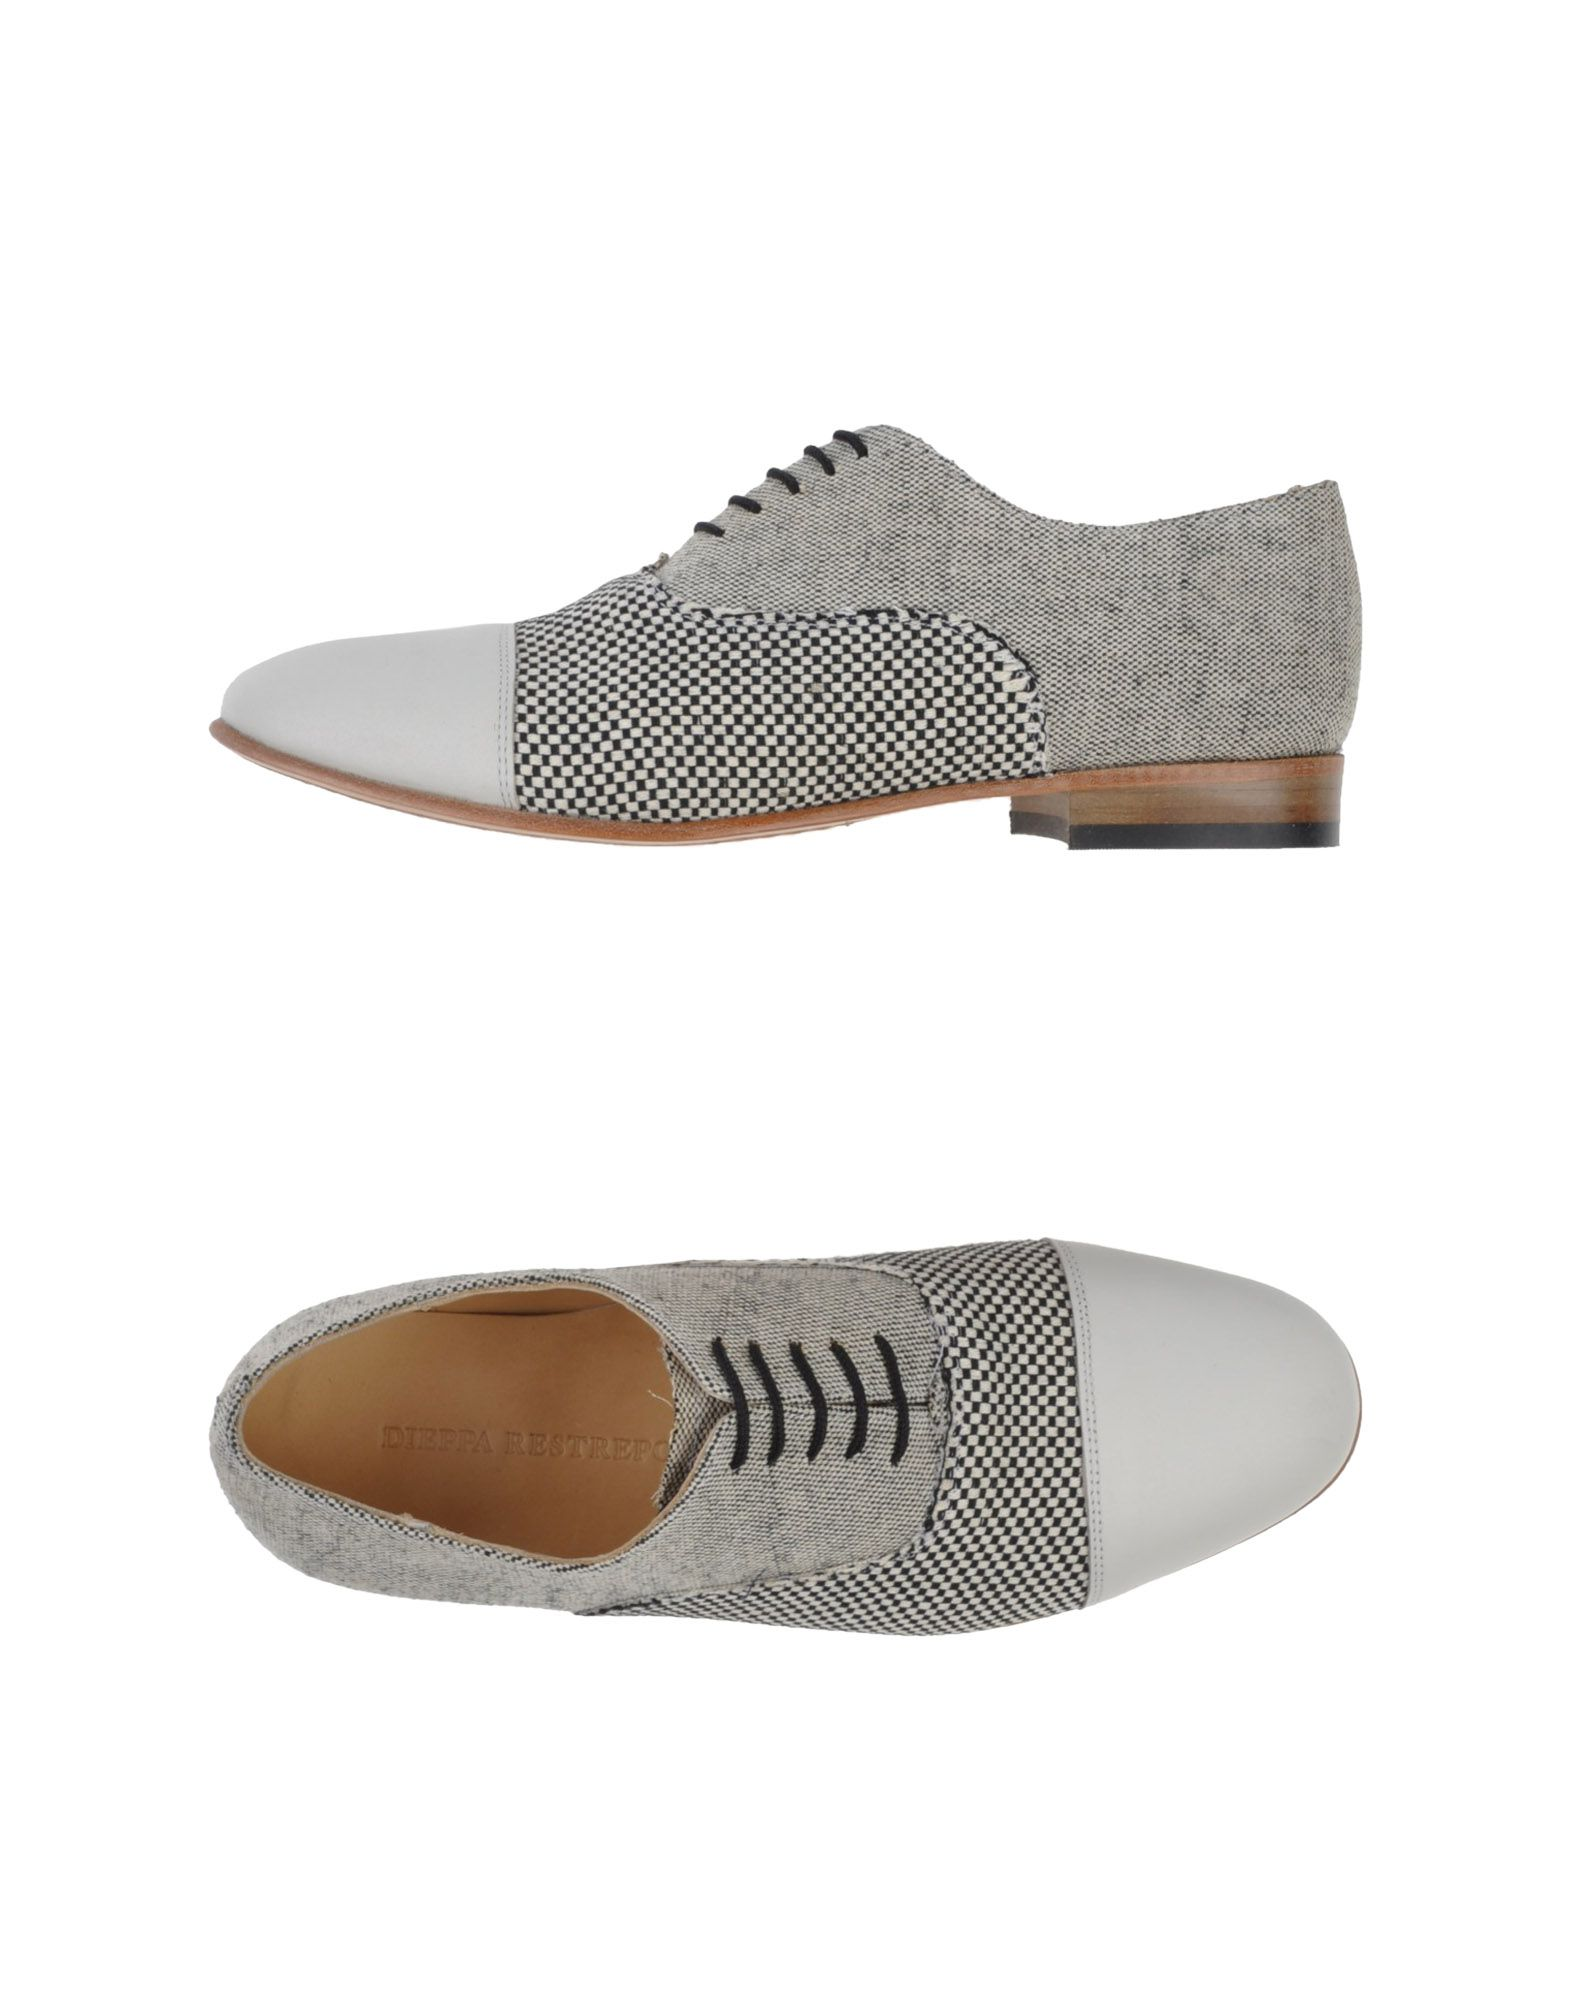 Фото - DIEPPA RESTREPO Обувь на шнурках обувь на высокой платформе dkny